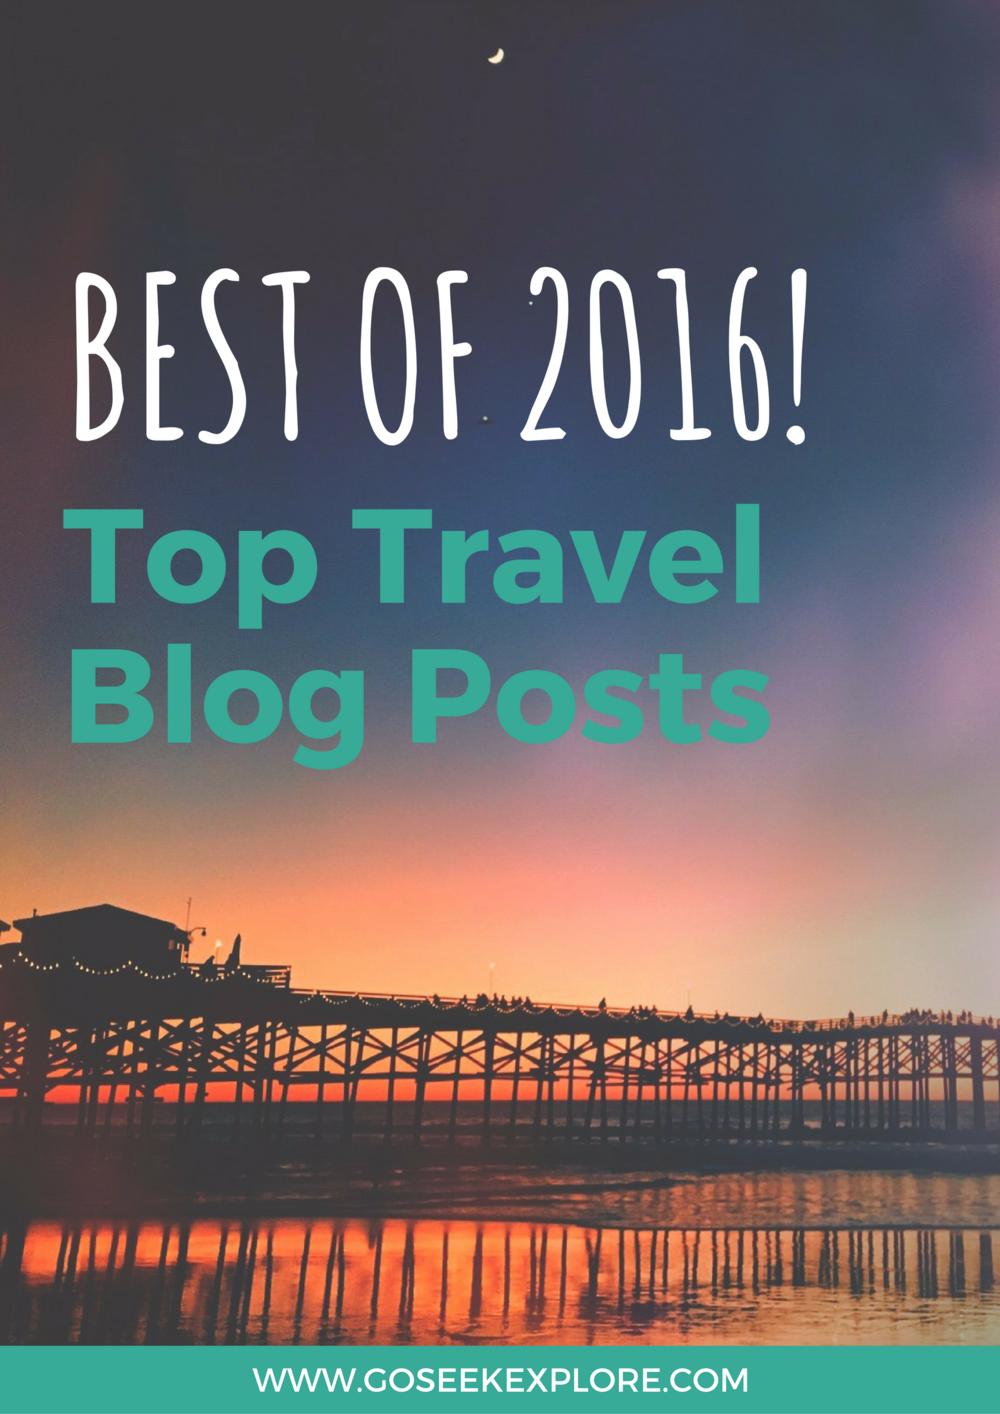 Top Travel Blog Posts on Go Seek Explore in 2016